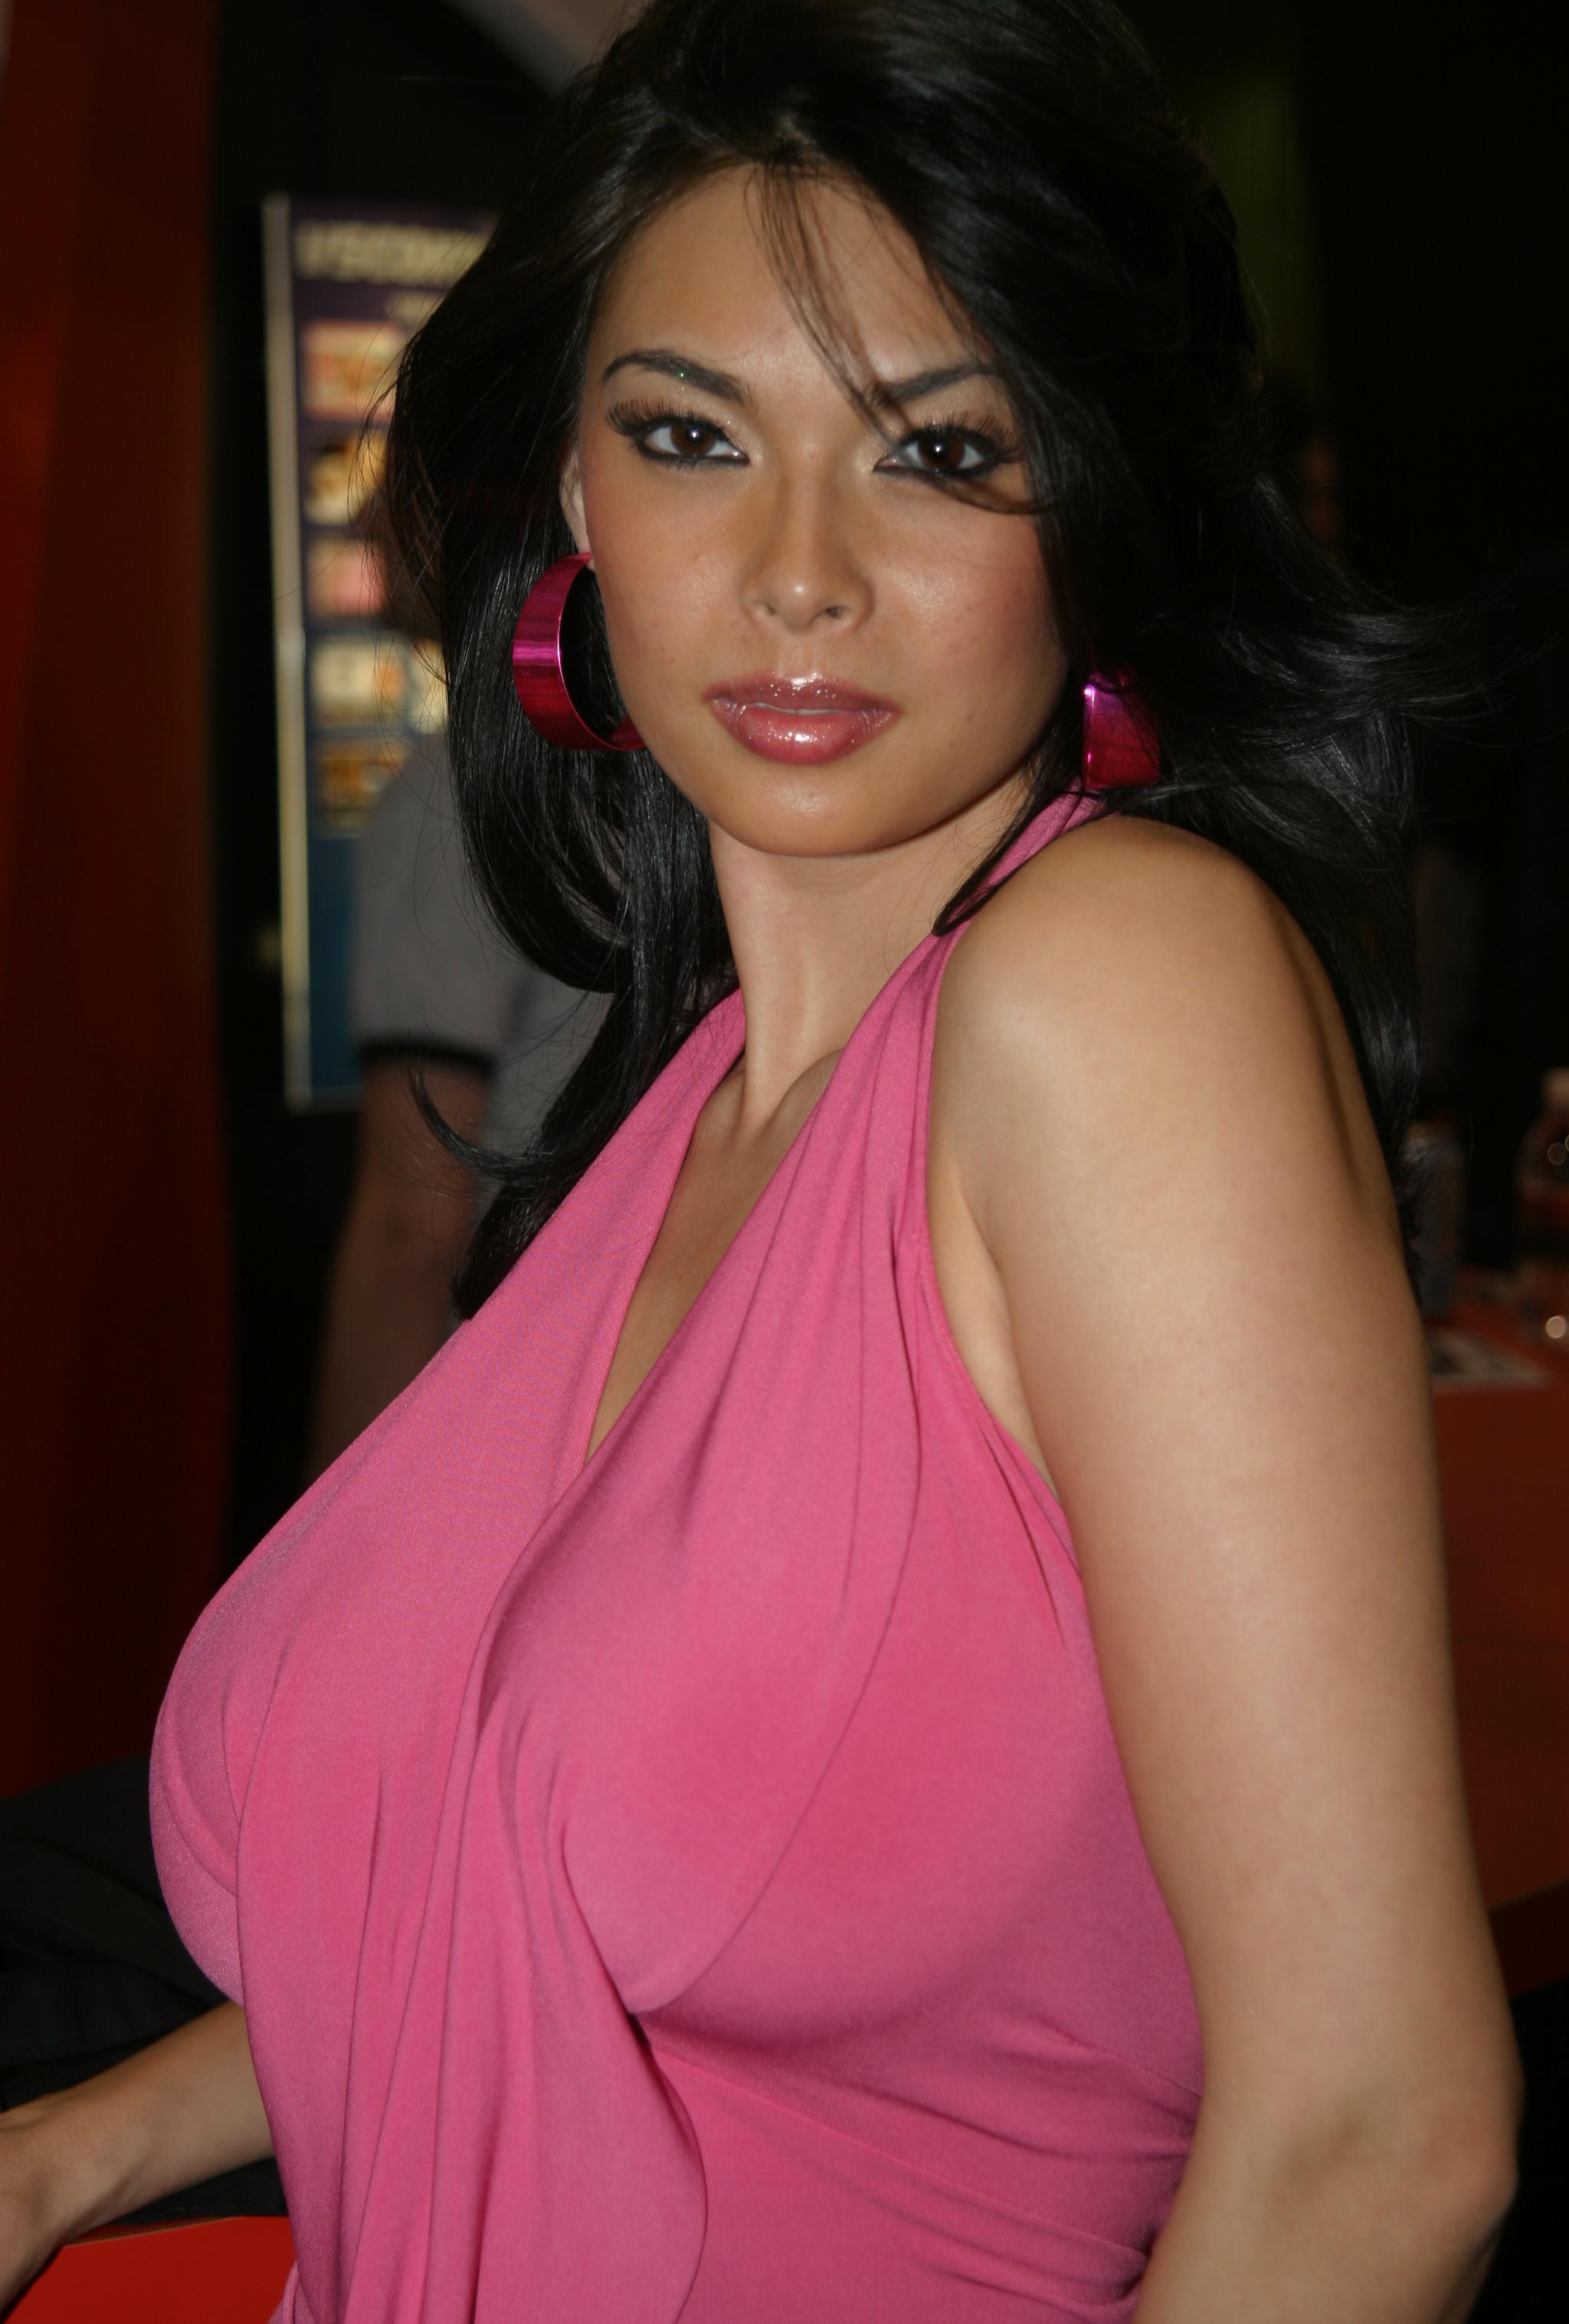 Famous Asian pornstar Tera Patrick modeling non nude in bikini № 1466305 загрузить